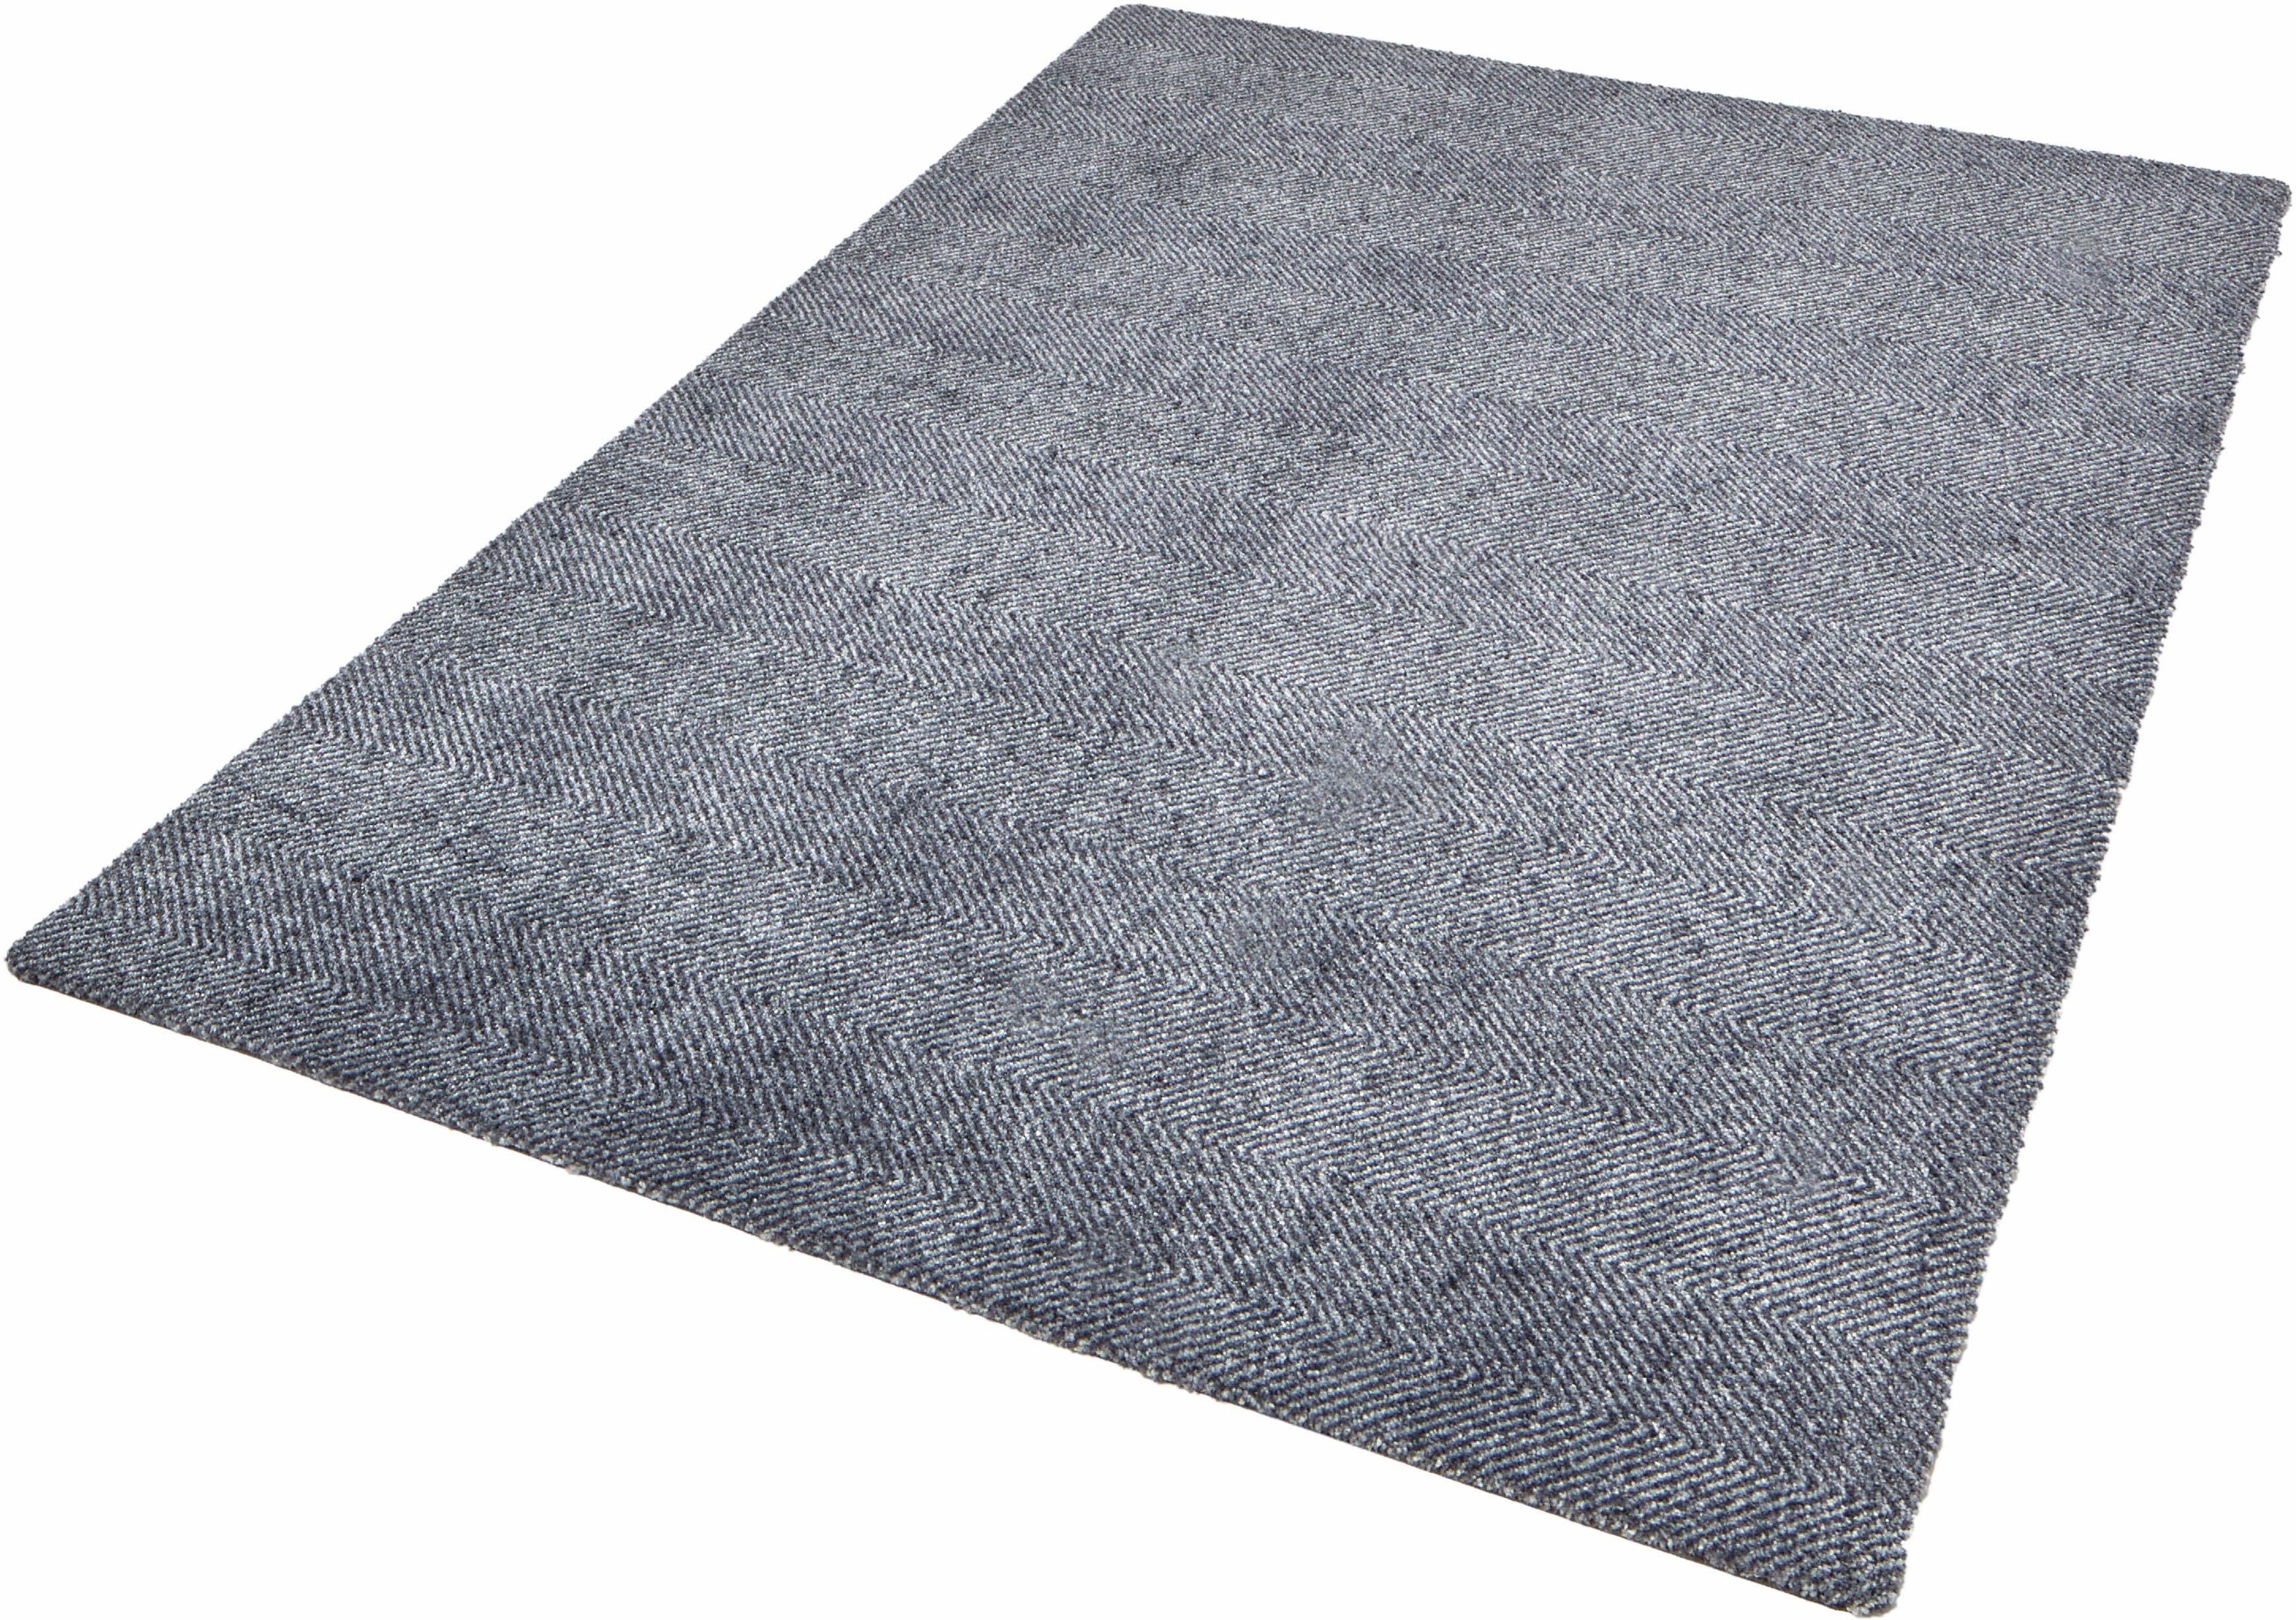 Teppich Clean & Go HANSE Home rechteckig Höhe 7 mm maschinell getuftet